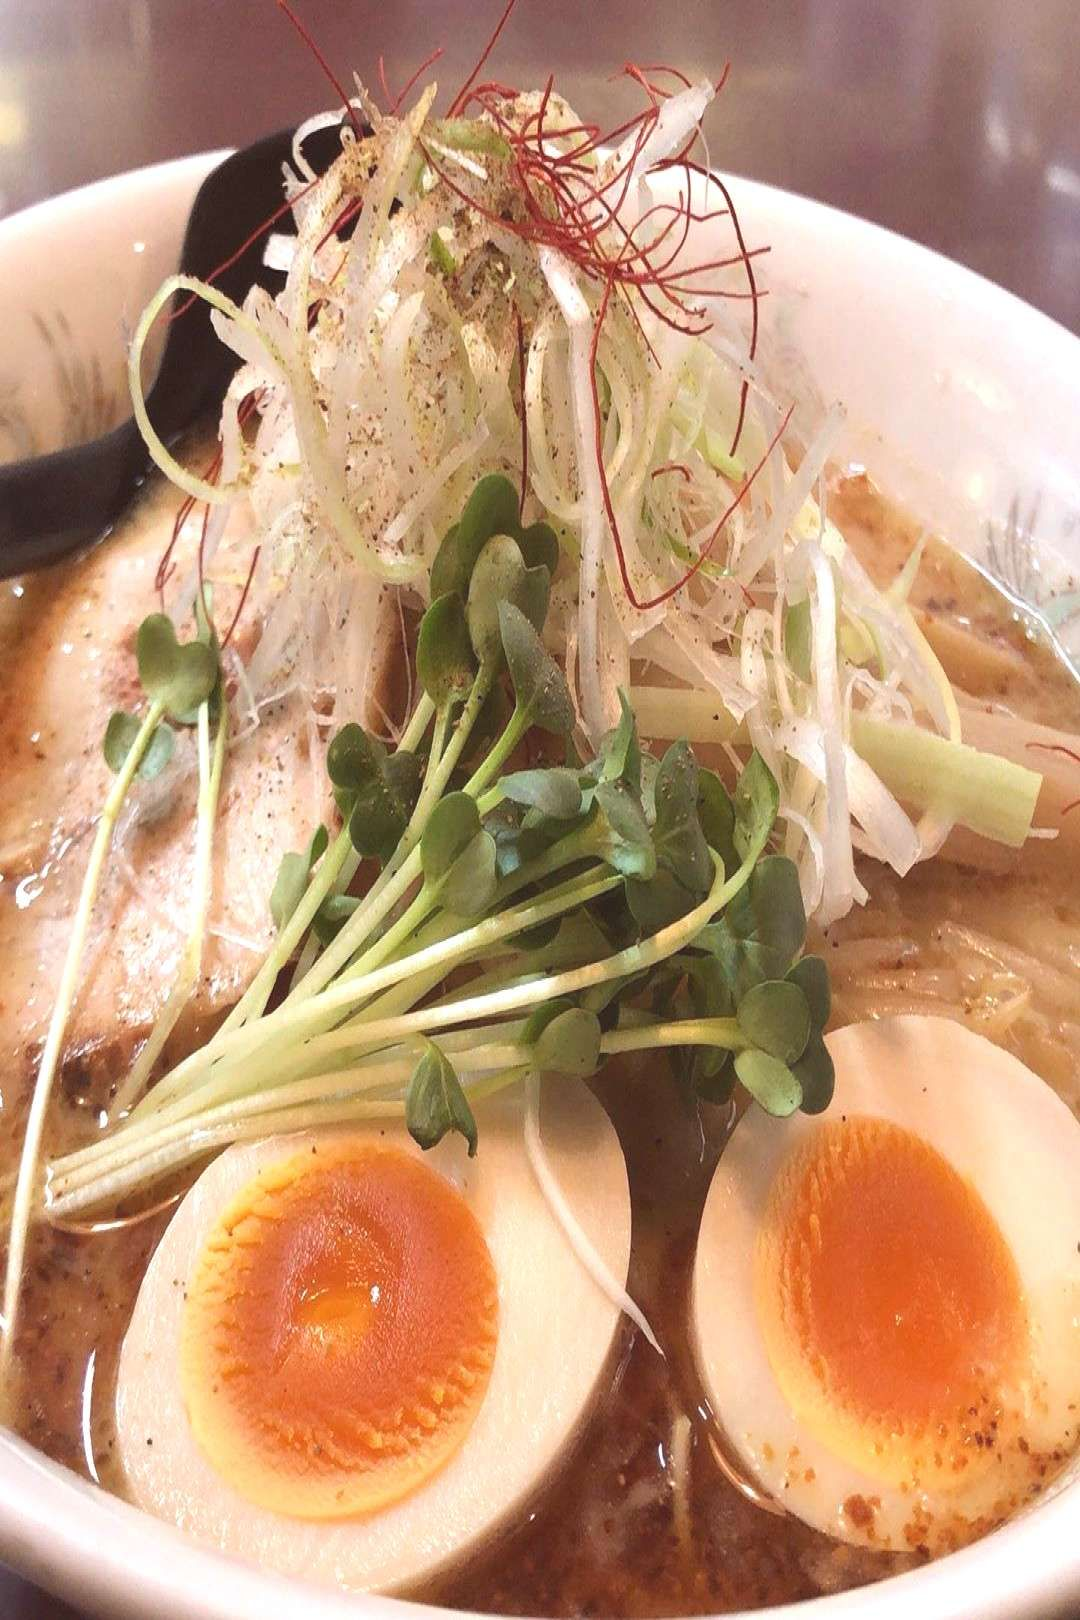 #food #ラーメン#味噌ラーメン#みそラーメン#中華そば#You can find Ramen noodles and more on our website.#ラーメン#味噌ラーメン#みそラーメン#中華そば#